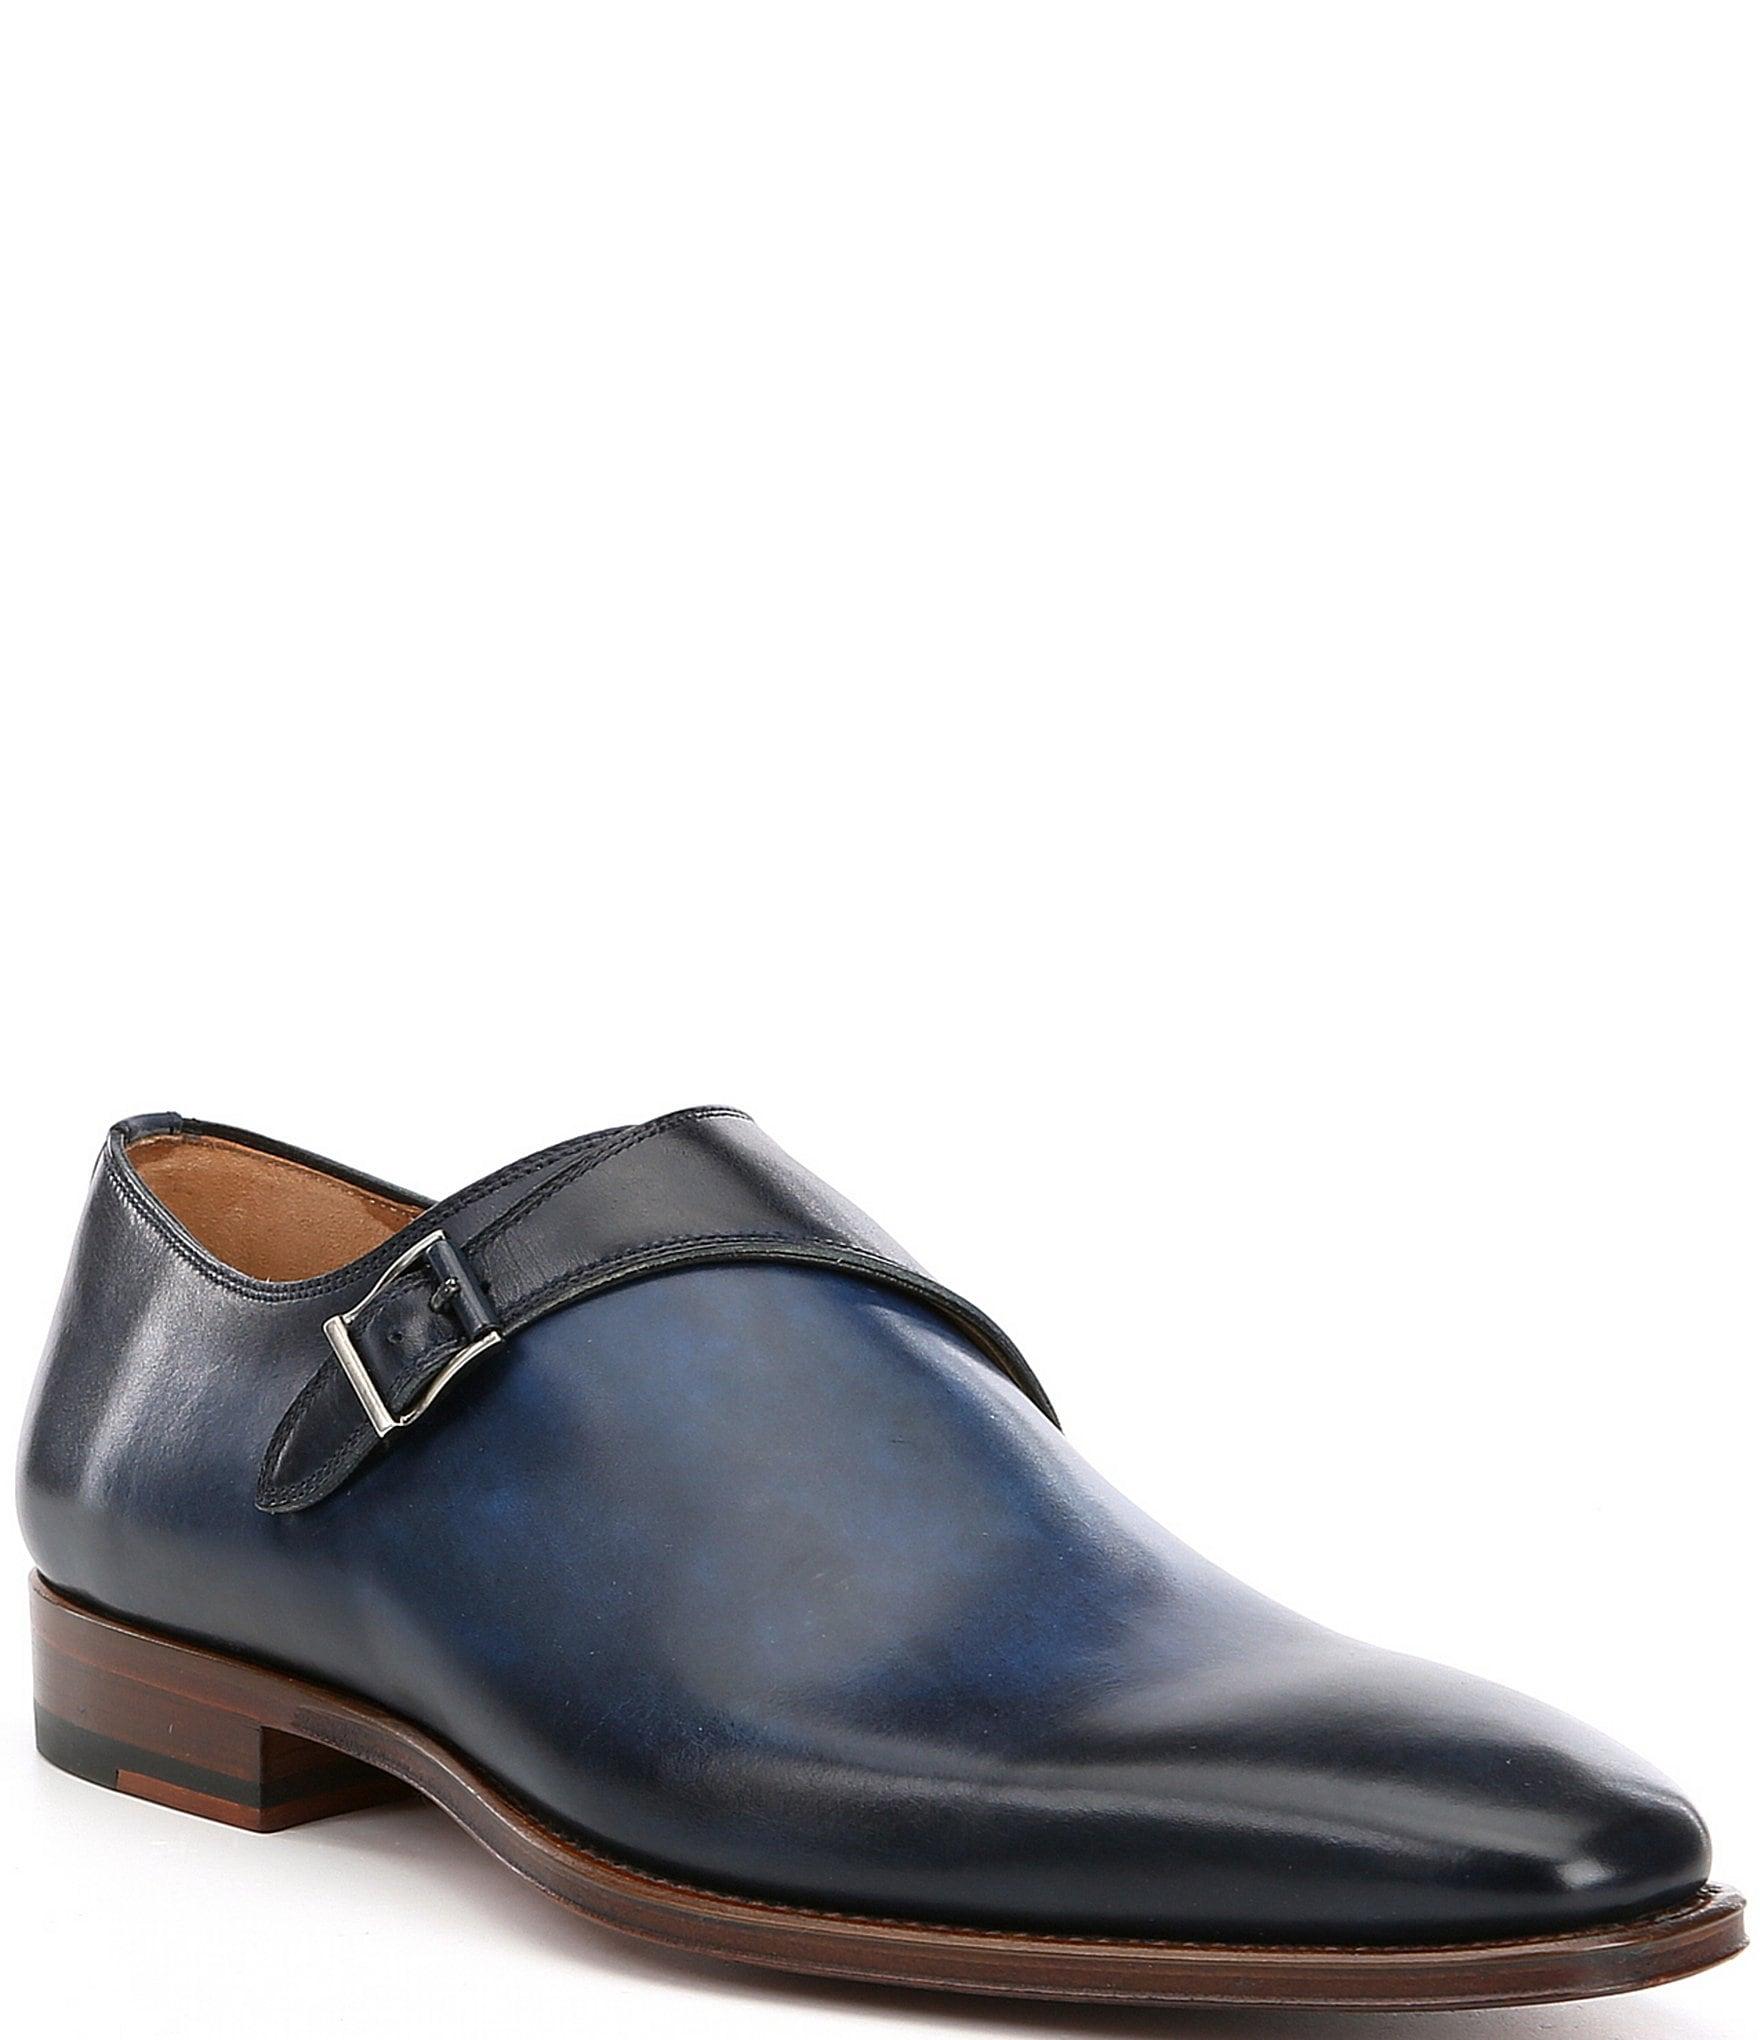 eae42e82f3 Men's Dress Shoes | Dillard's